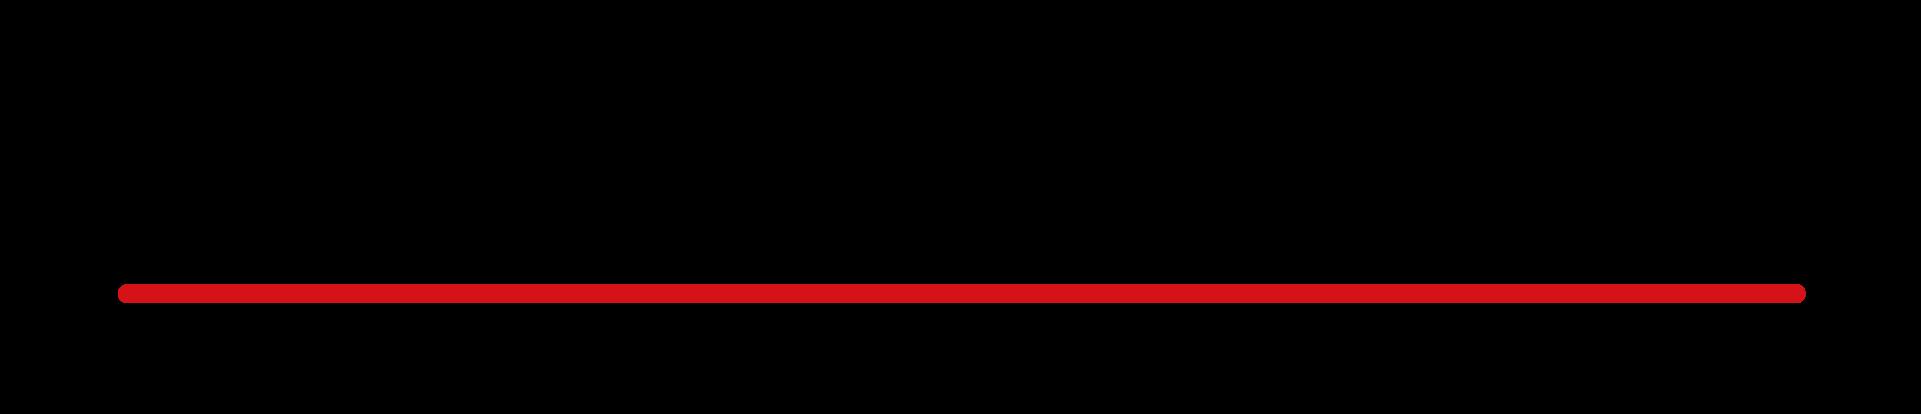 Alloy Doctor Pty Ltd Logo